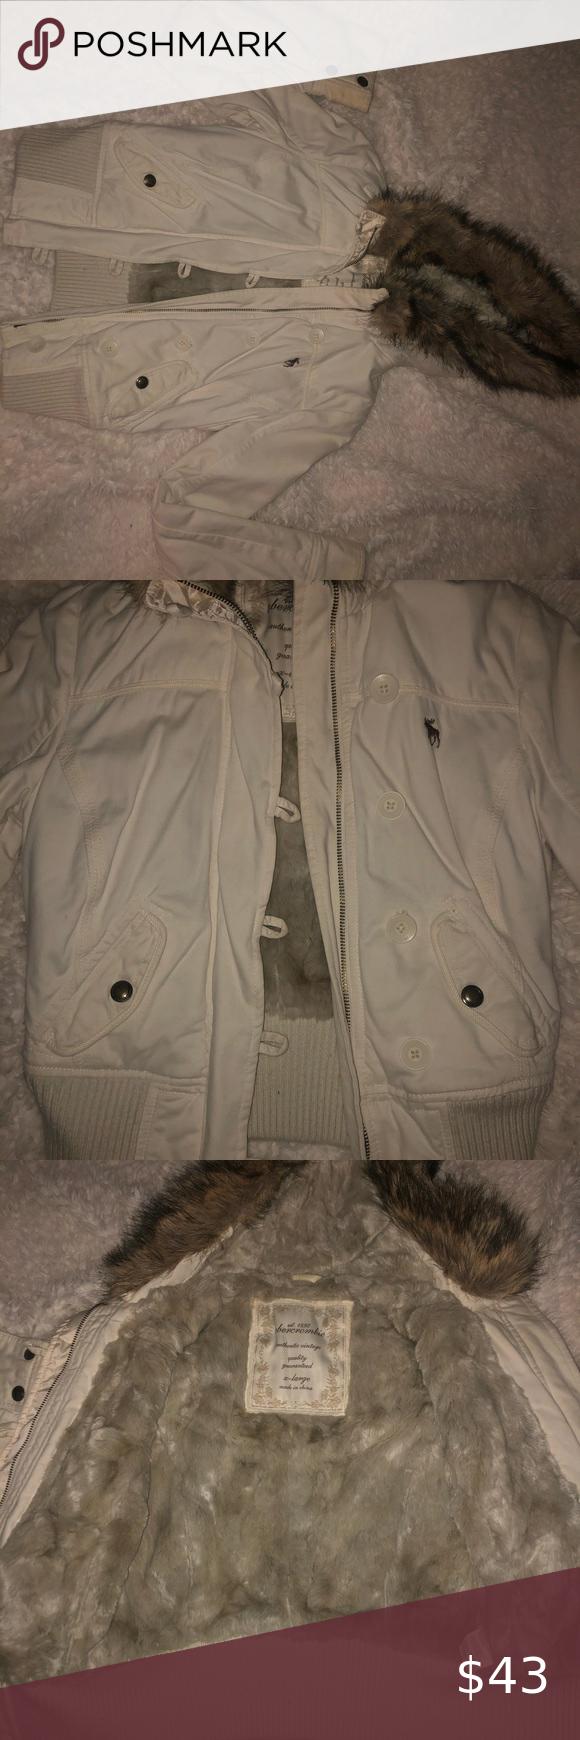 Abercrombie Fitch Authentic Vintage Jacket Vintage Jacket Abercrombie And Fitch Jackets Warm Jacket